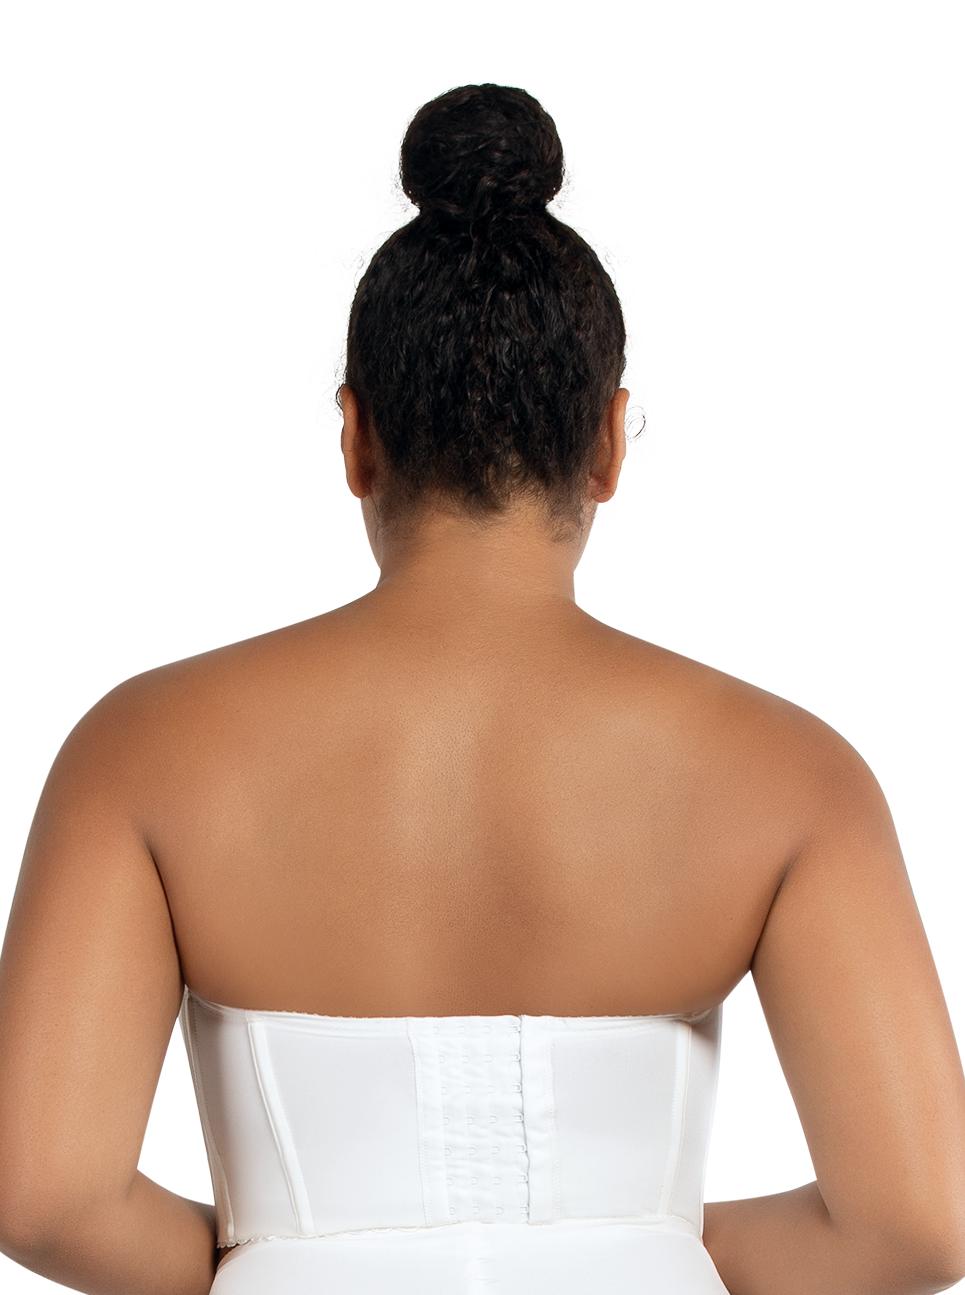 PARFAIT Elissa StraplessContourBustierP50116 PearlWhite Back - Elissa Short Bustier Pearl White P50116